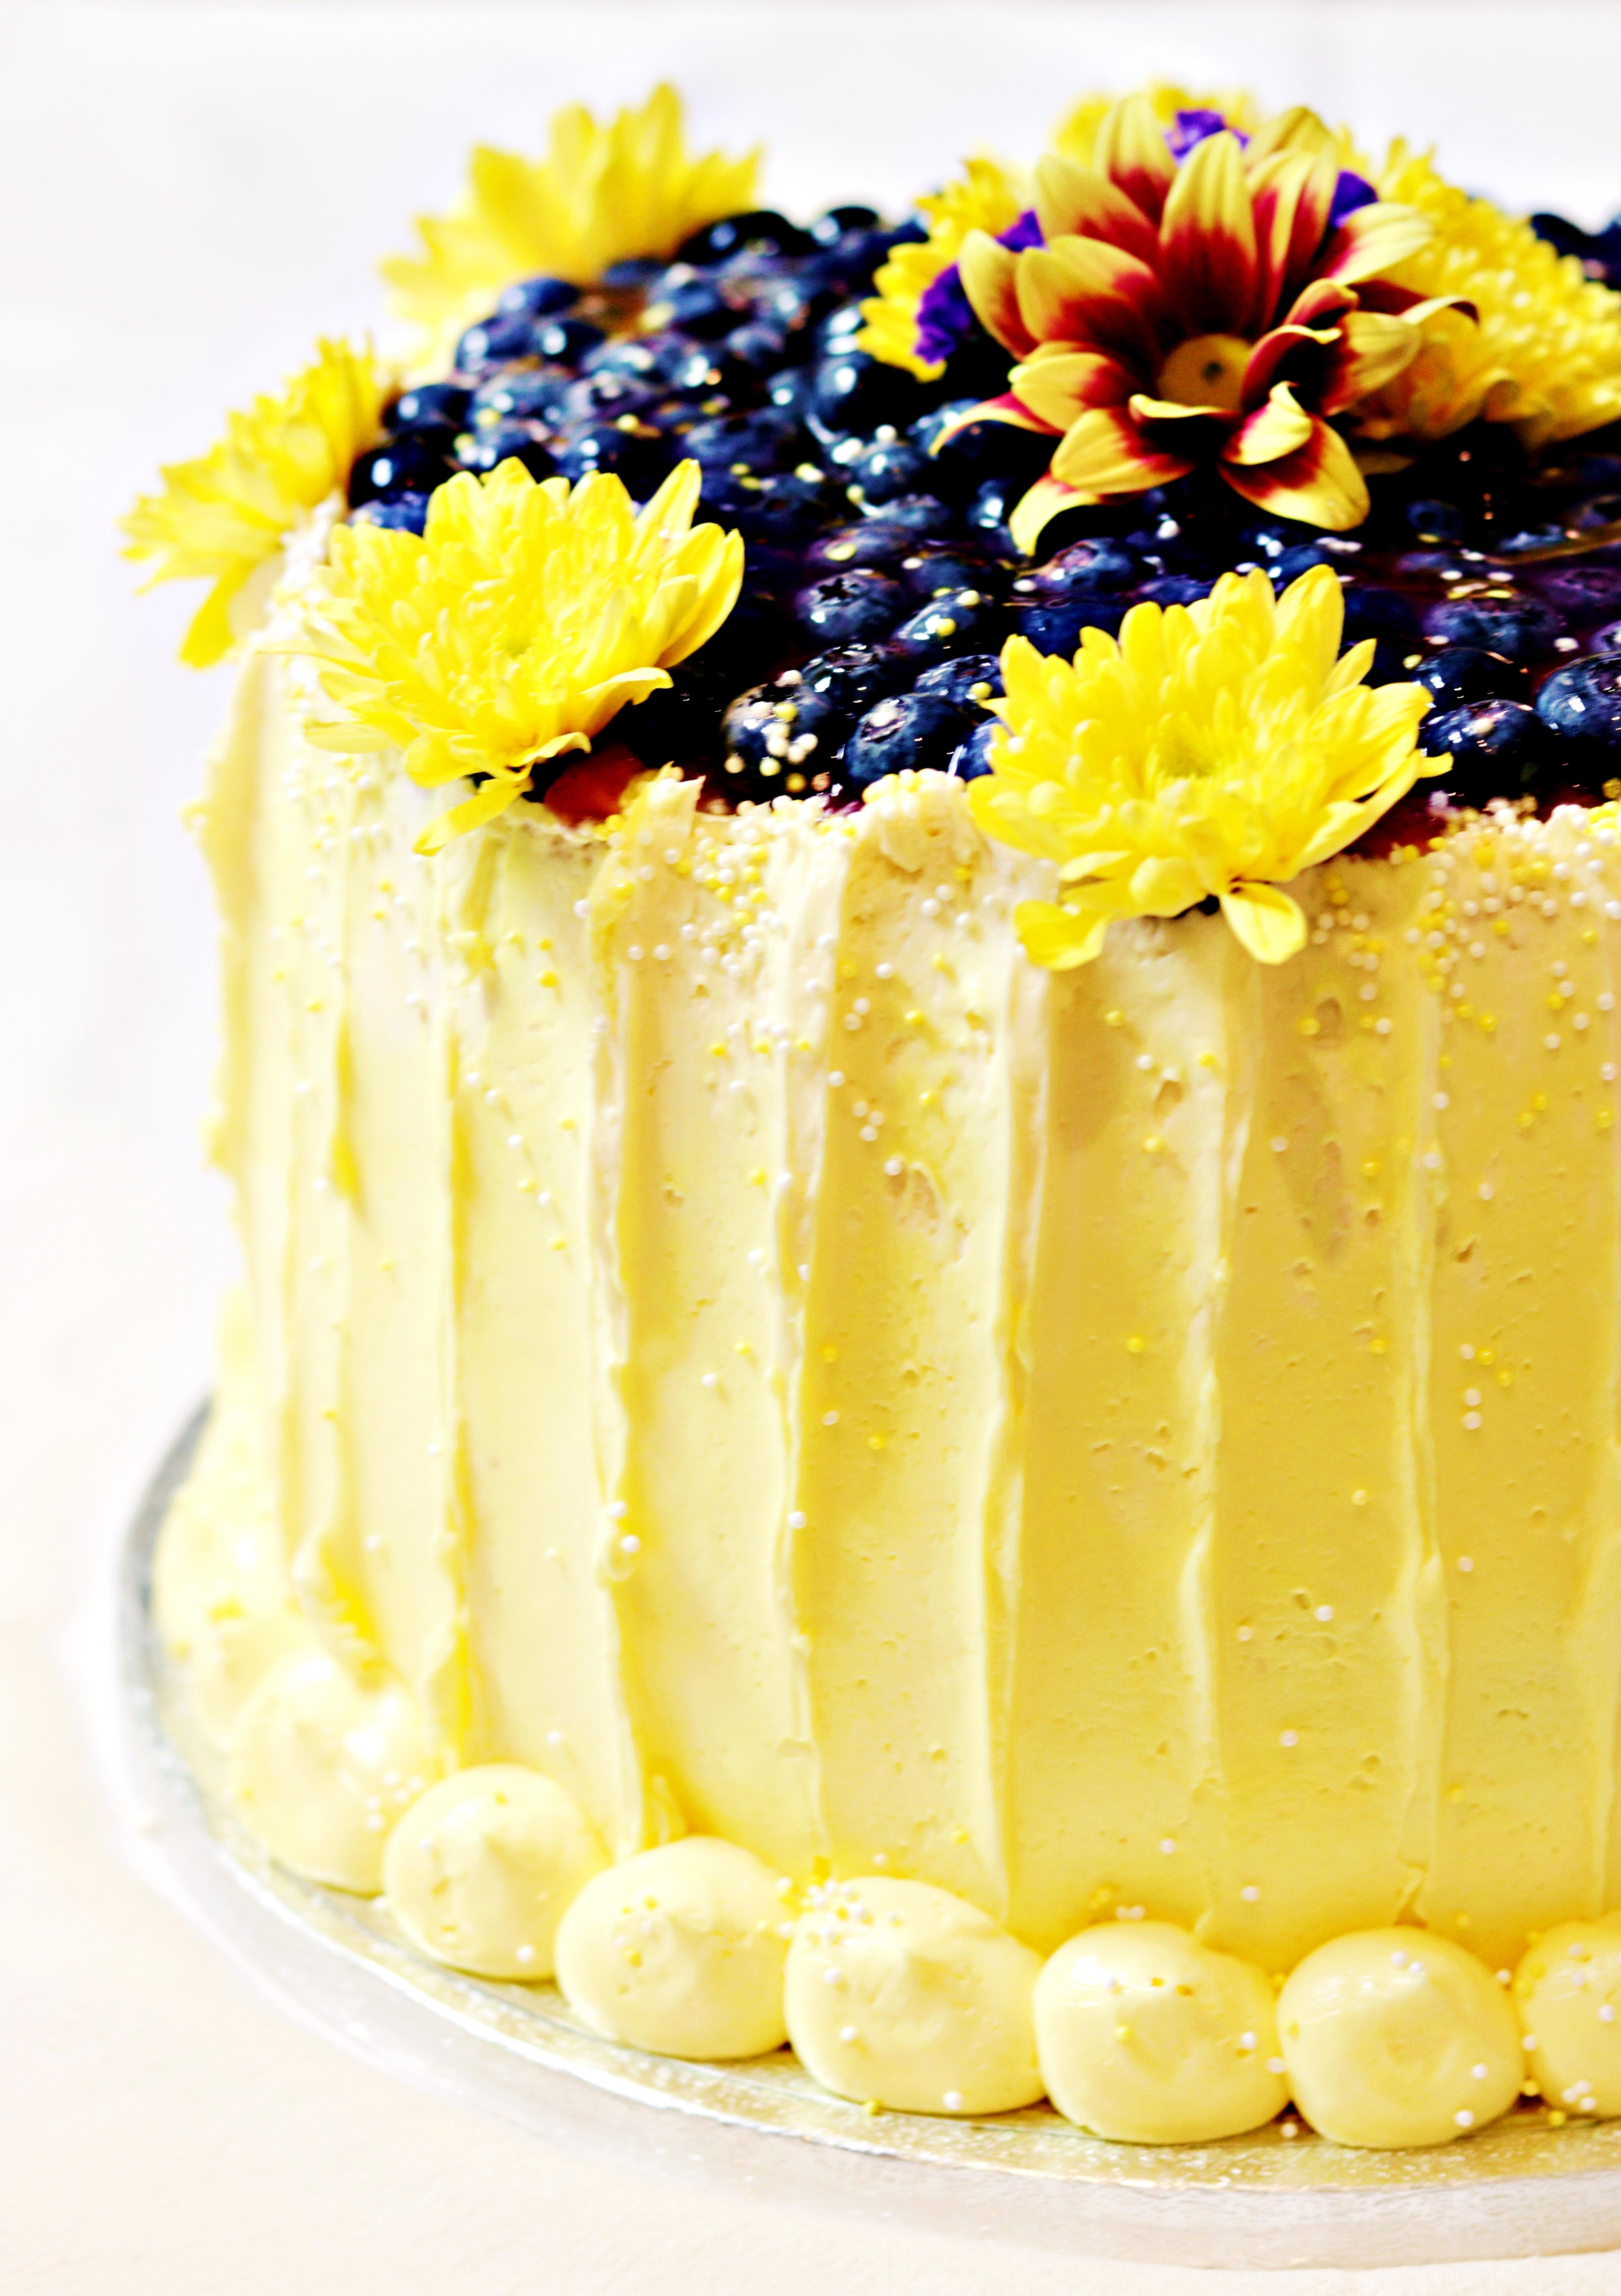 Lemon & Blueberry Cake Tortology E17